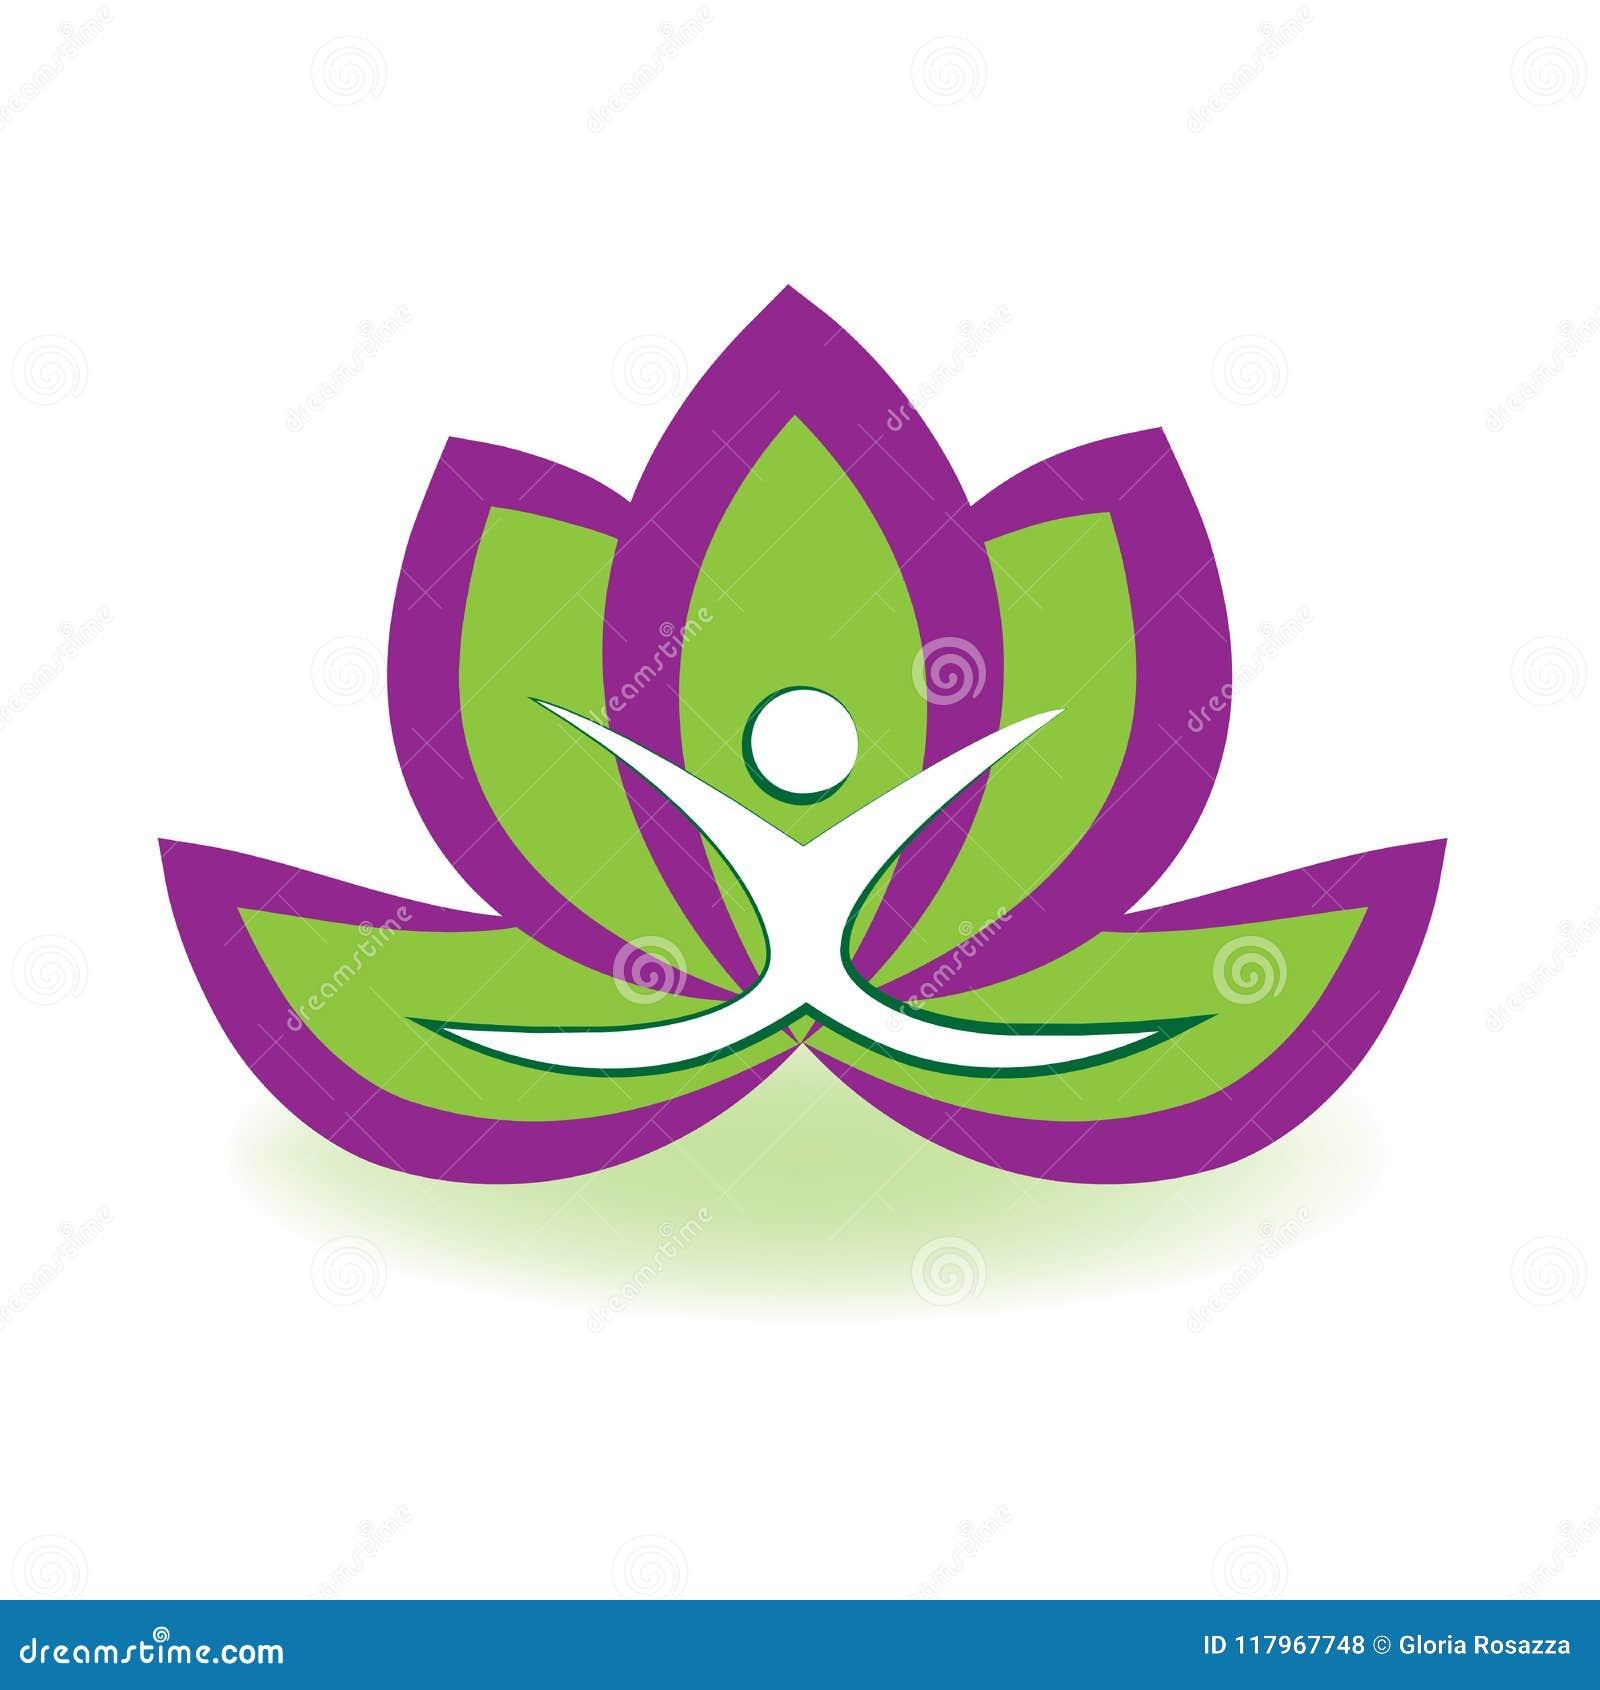 Yoga Man And Lotus Flower Logo Vector Image Illustration Graphic